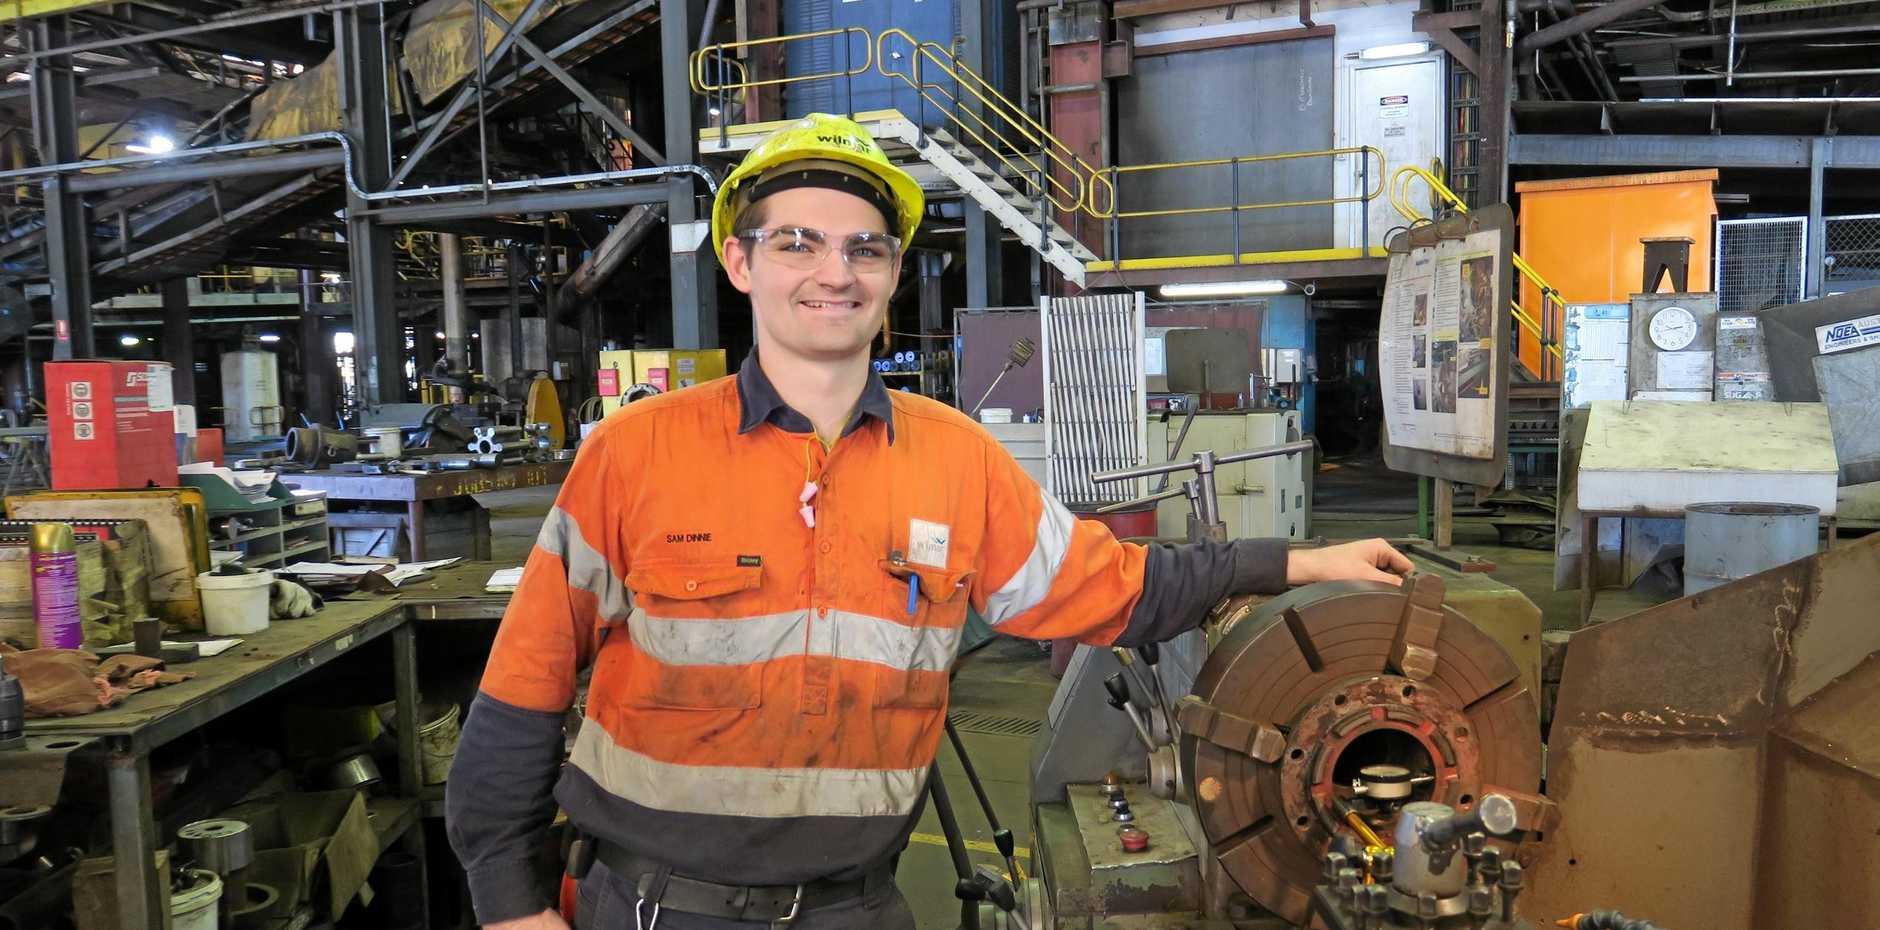 Coal mines hunting for apprentices across Mackay region | Daily Mercury